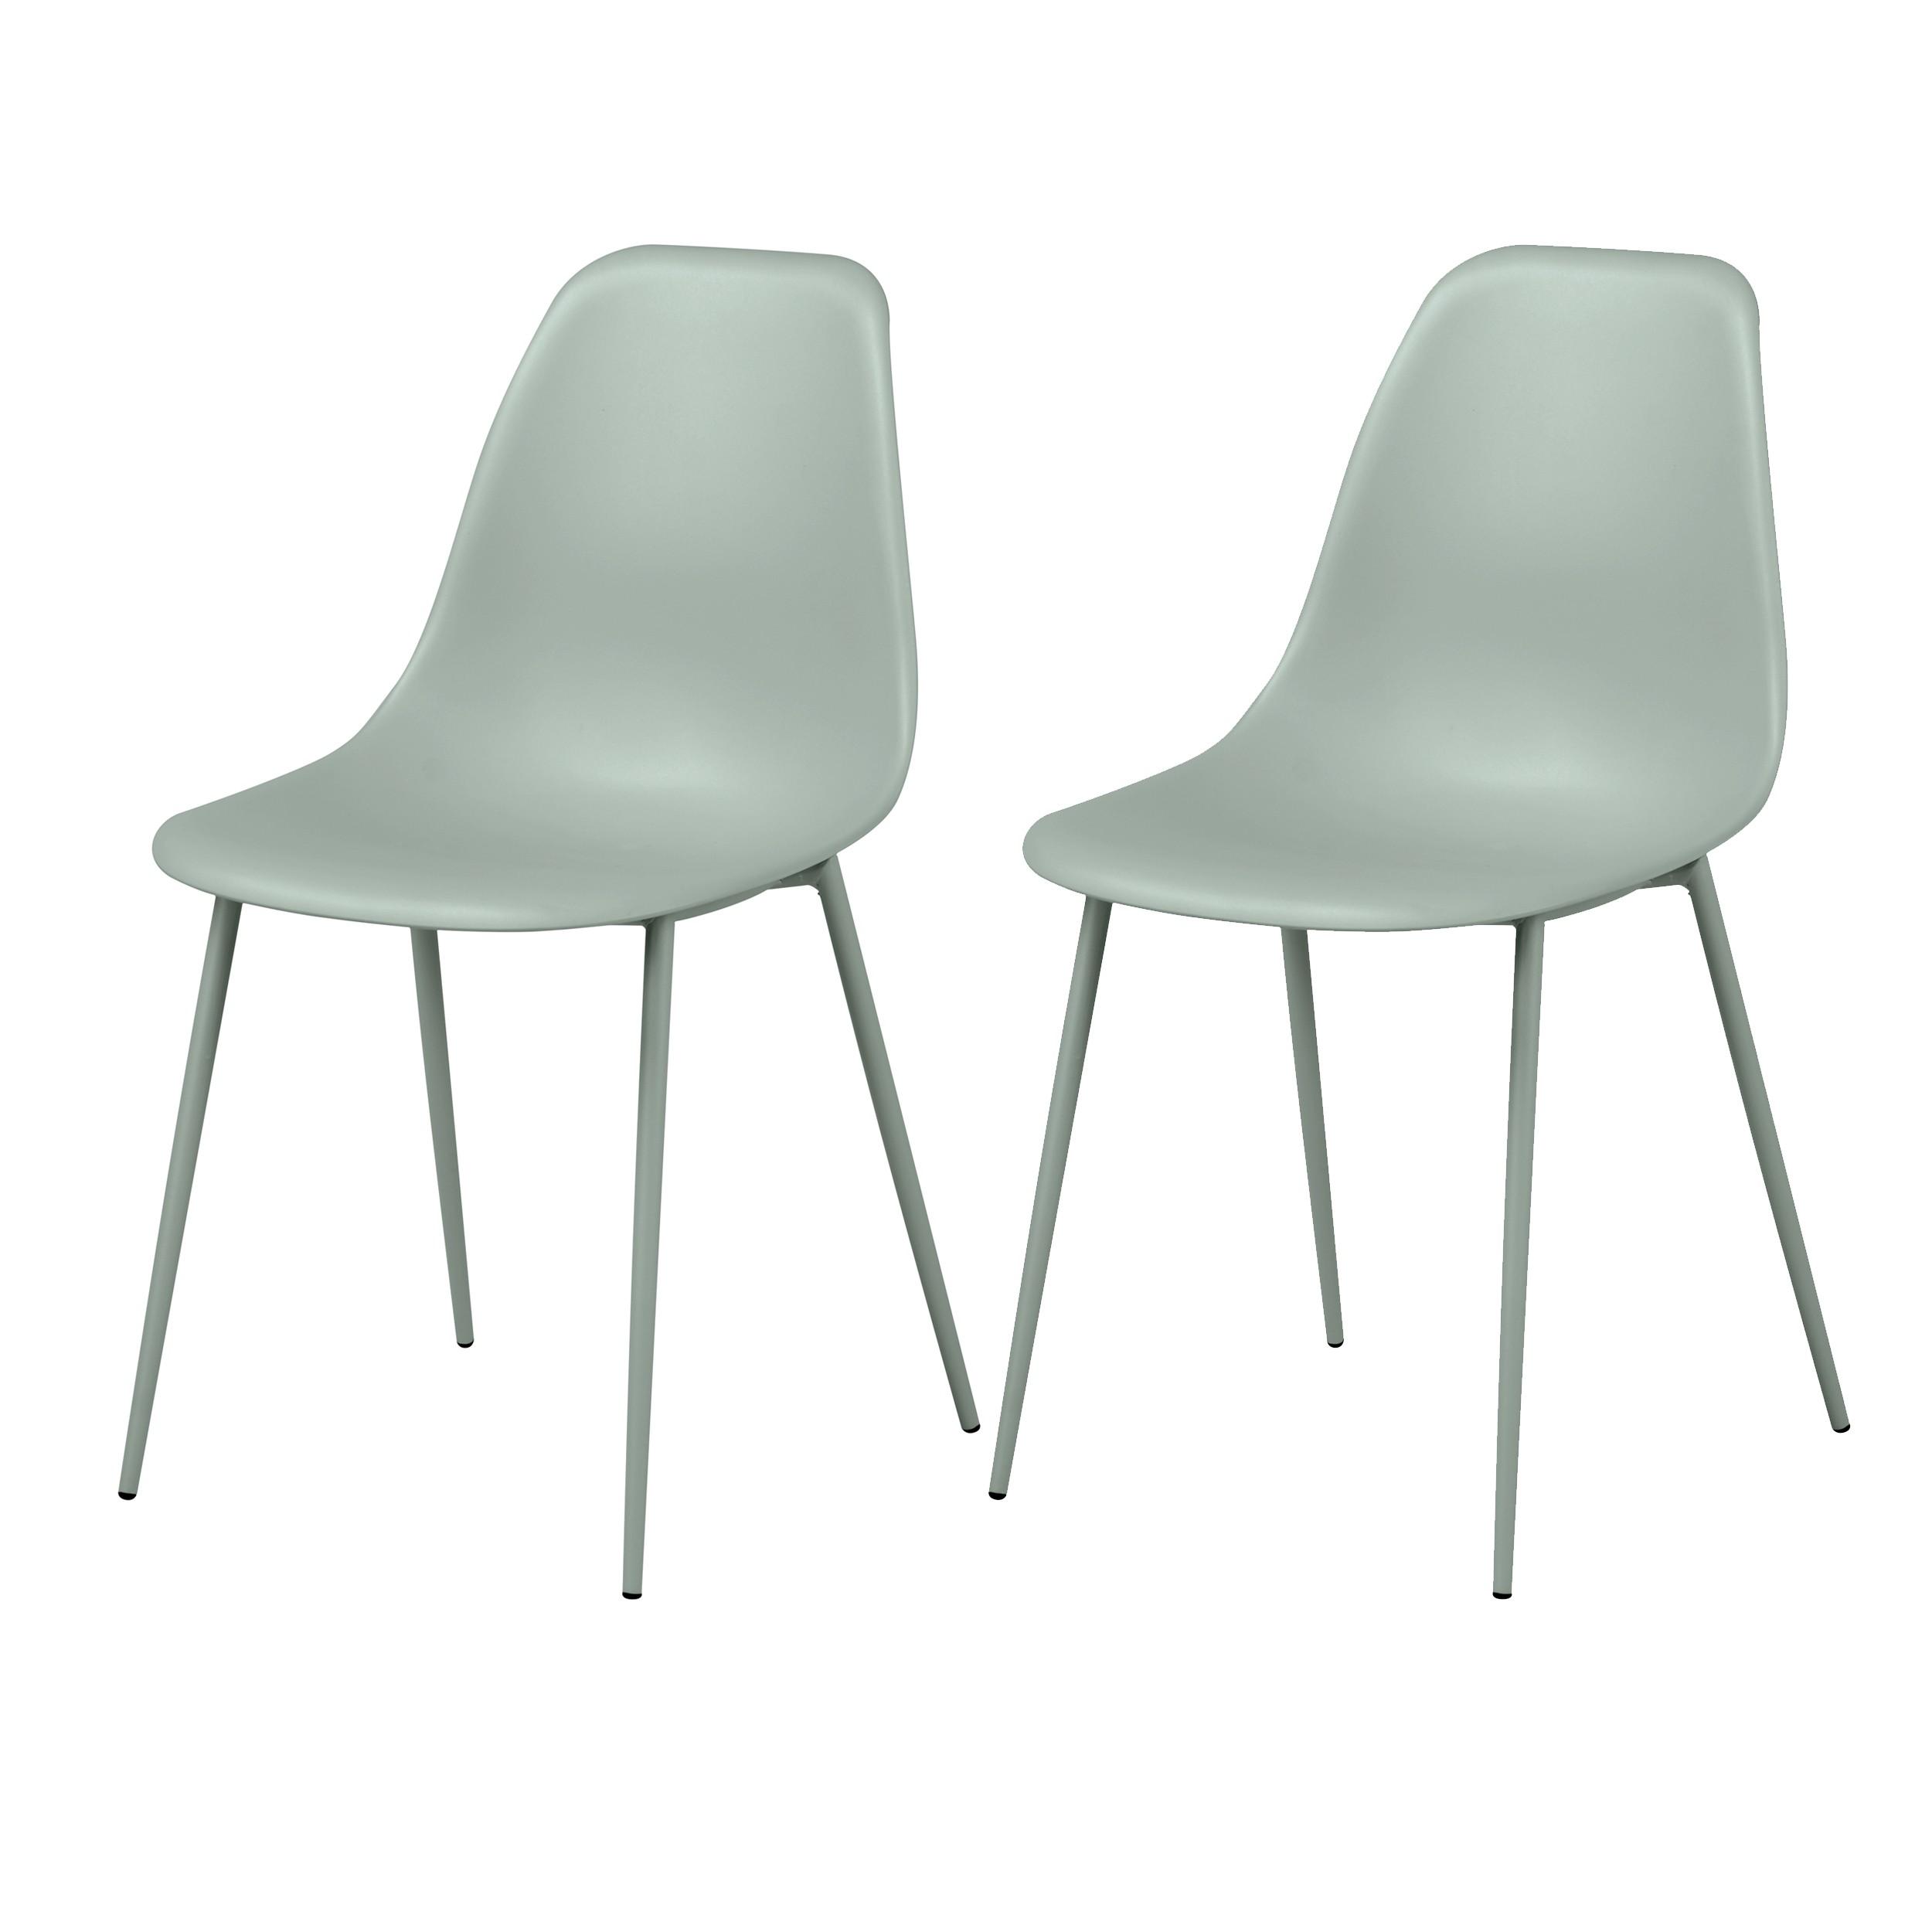 acheter chaise lot de 2 vert pastel design